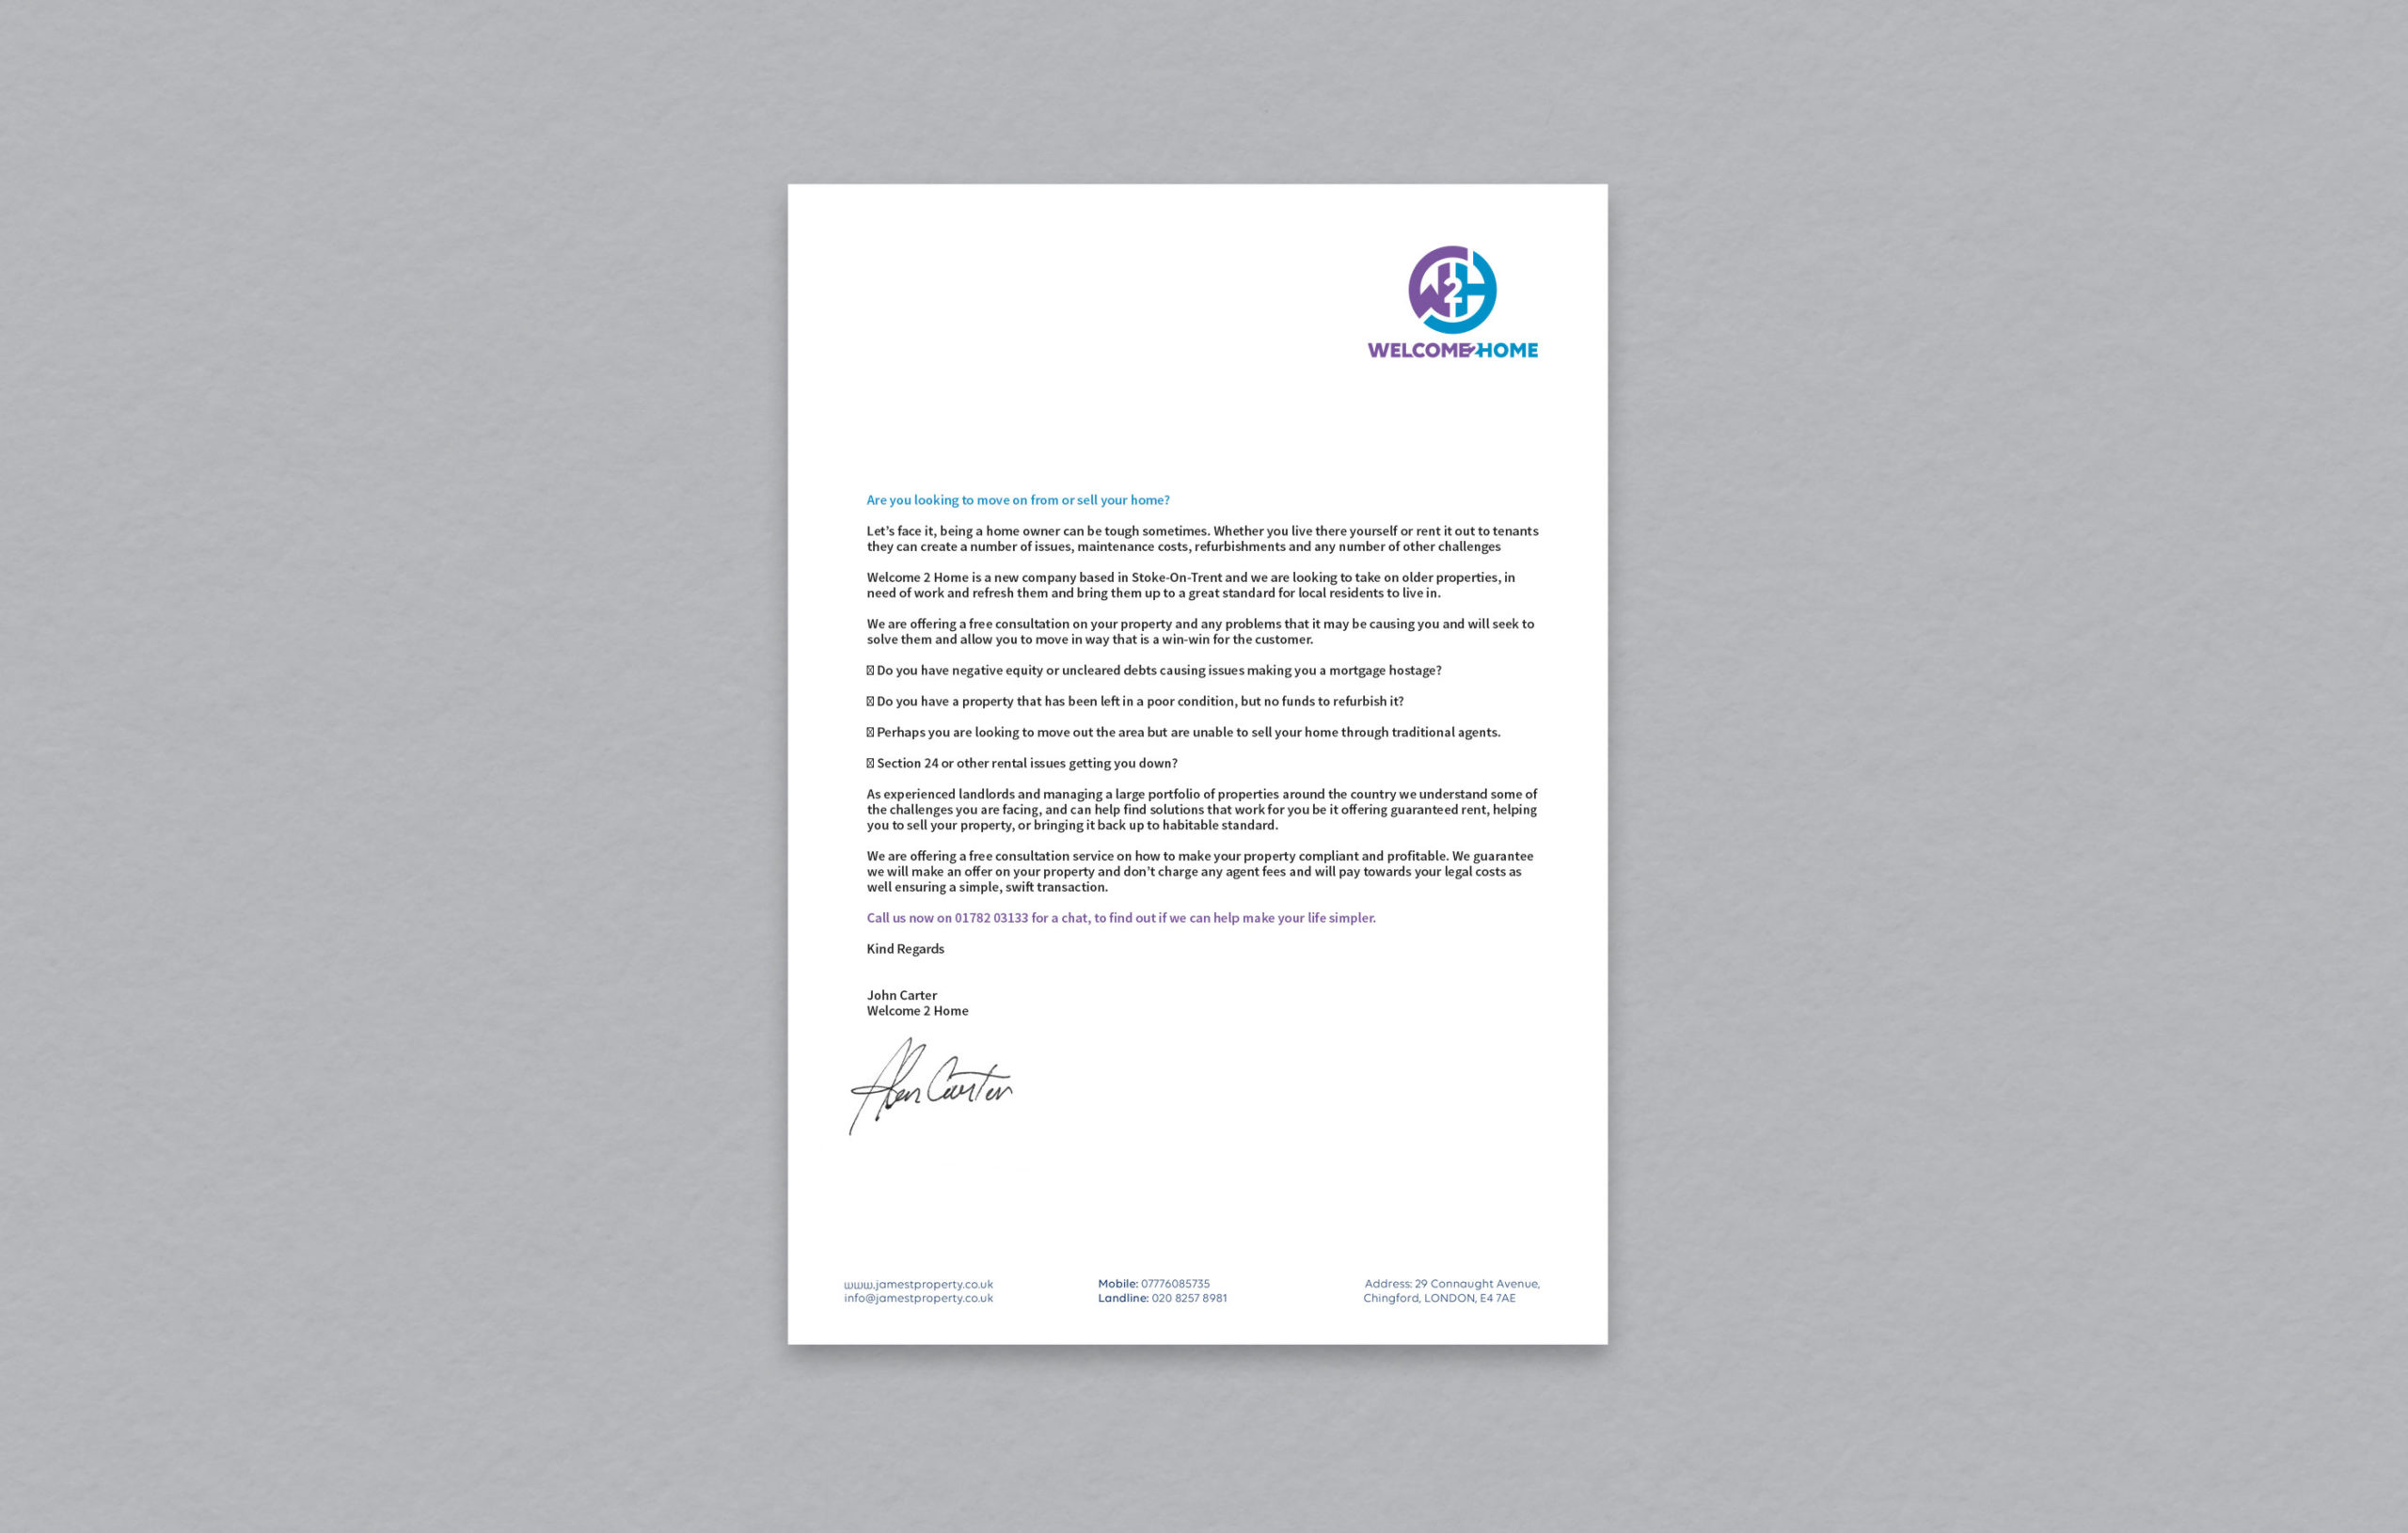 Digital letterhead designed by BONB Creative & Design